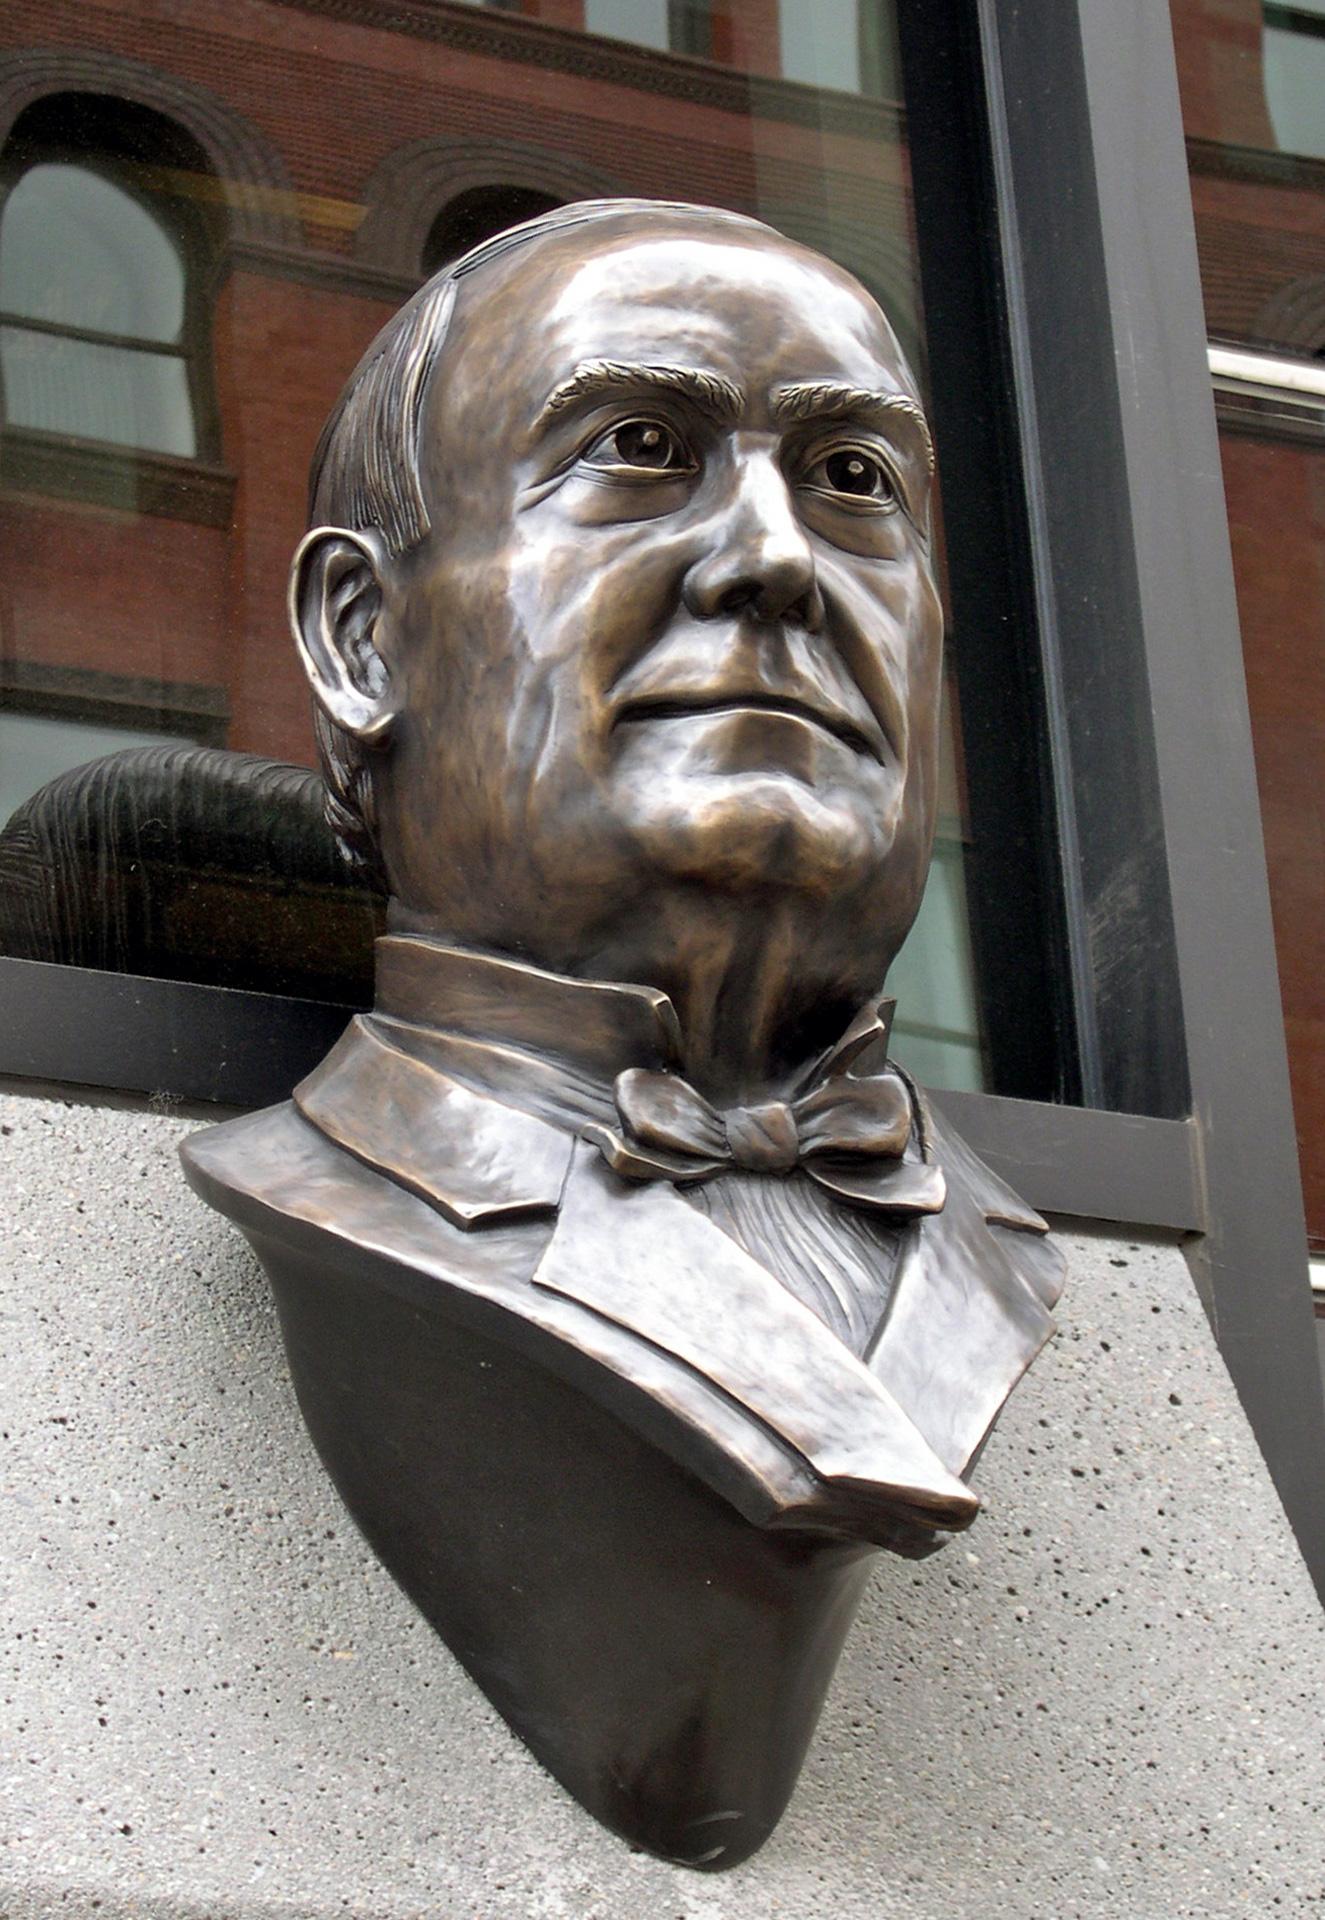 James N. Glover